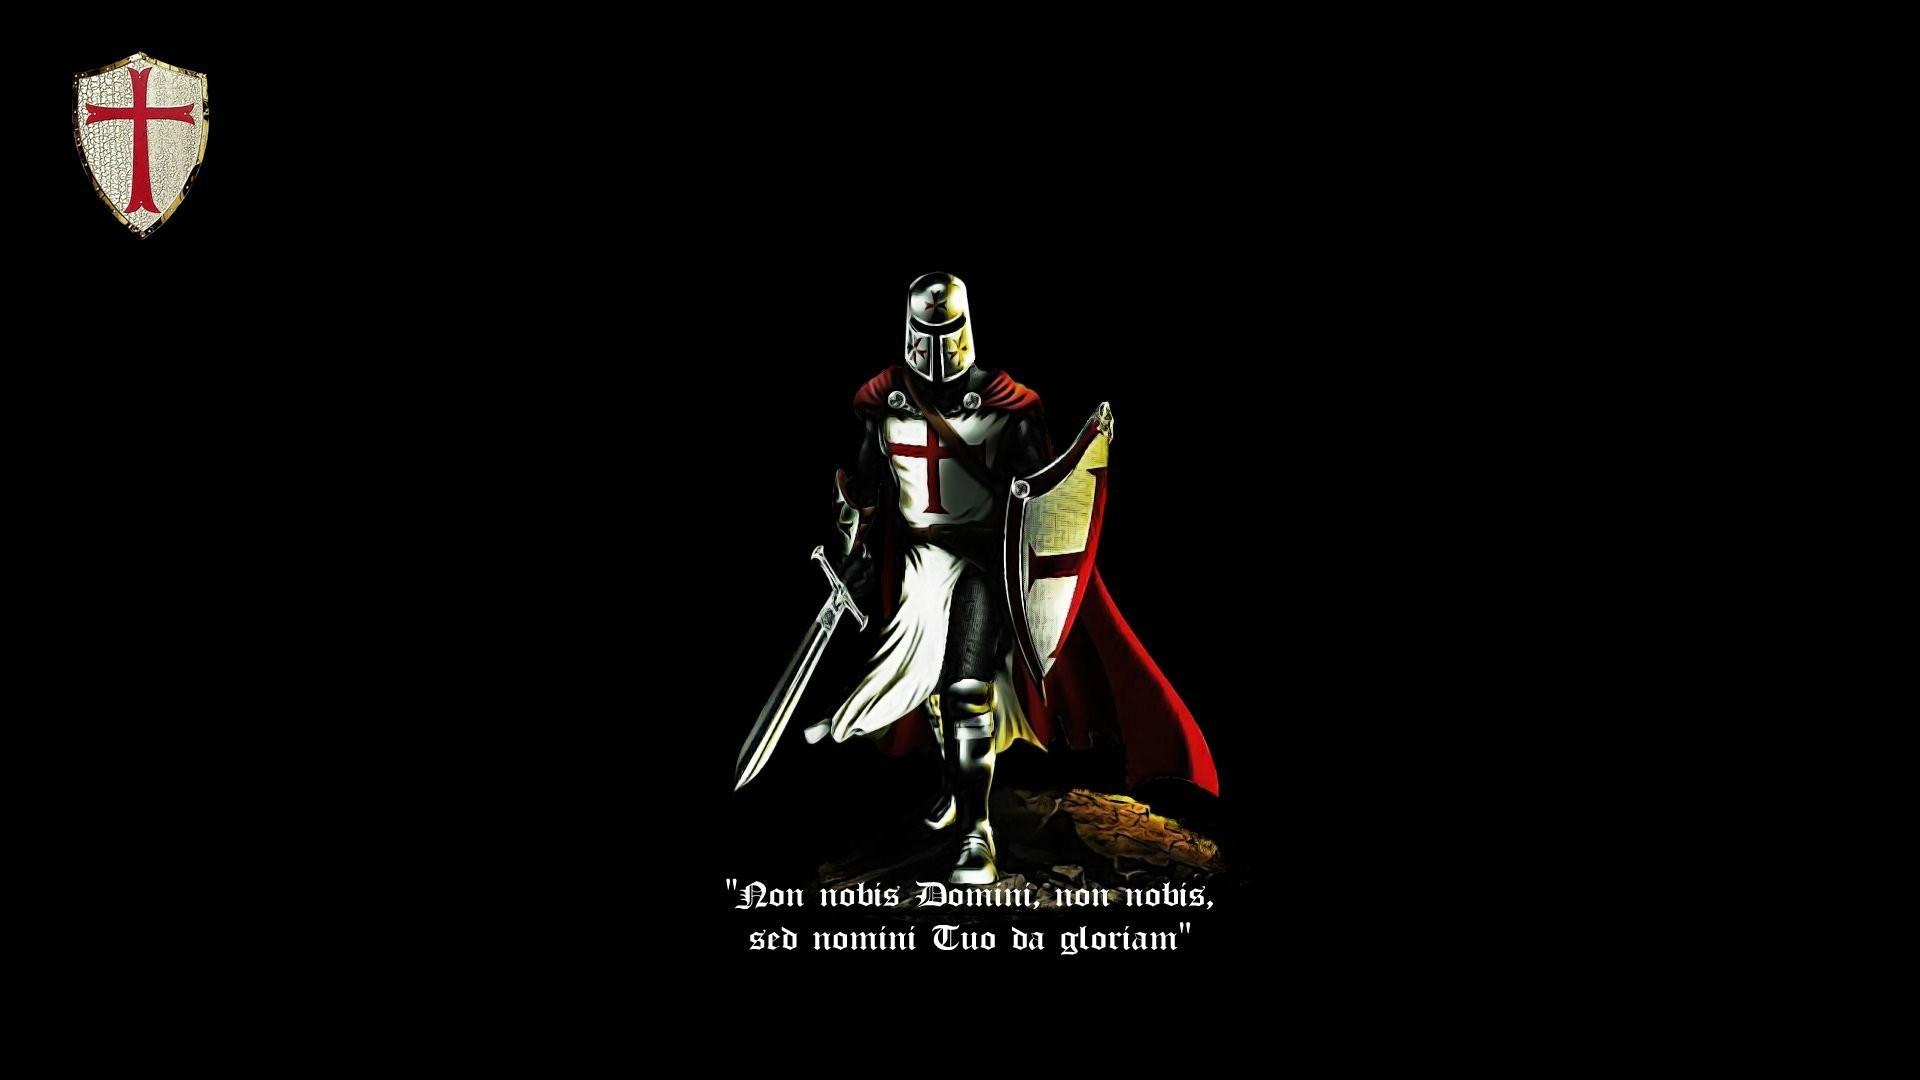 Res: 1920x1080, Knights-Templar-Wallpaper-PIC-WPHR16660